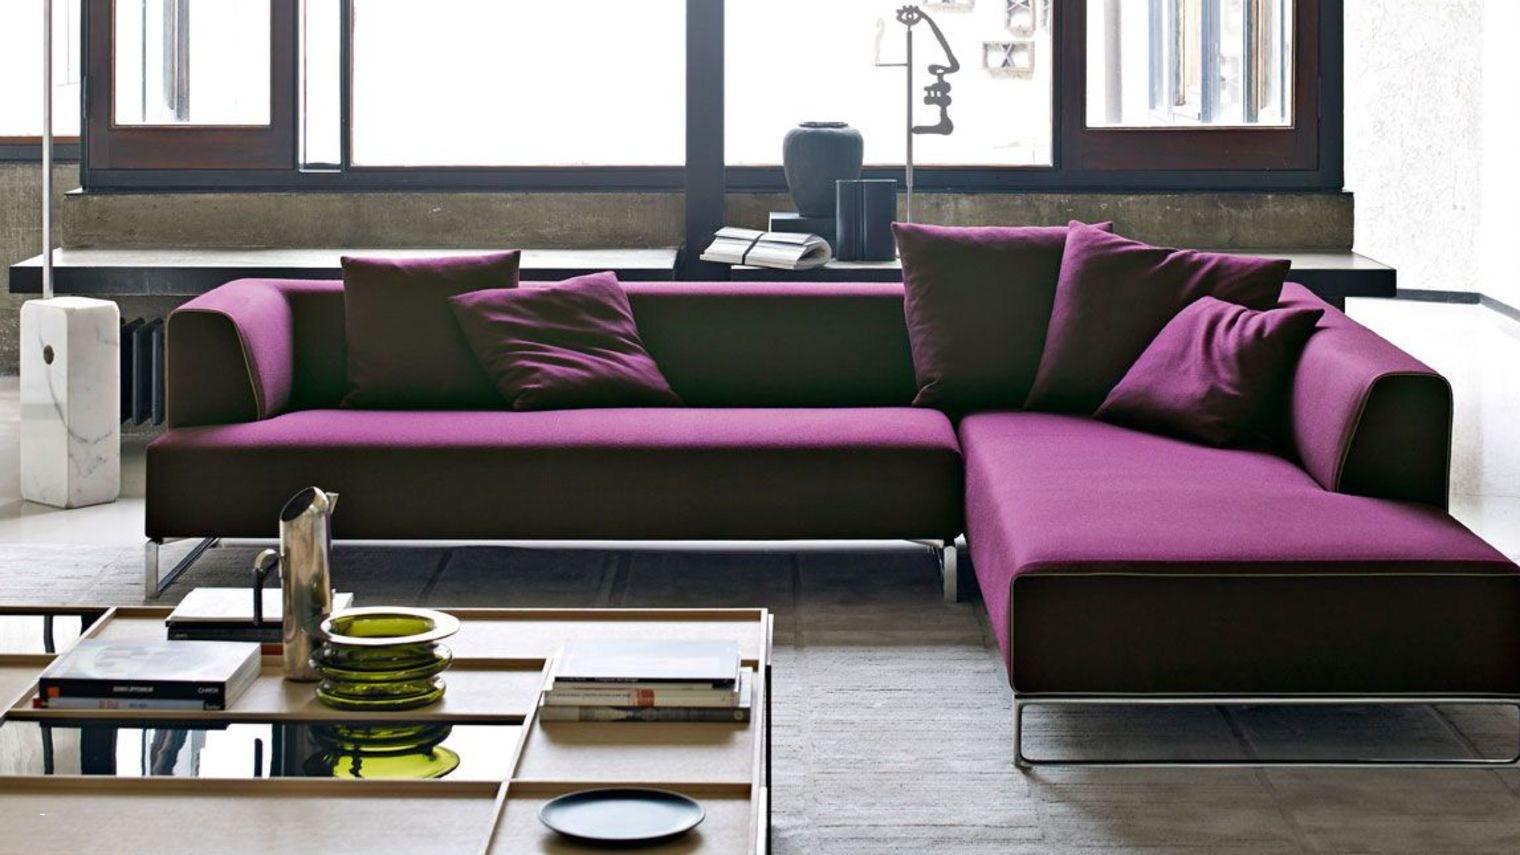 Canapé Angle Alinea Beau Photographie 27 Incroyable Canapé Design Design De Maison